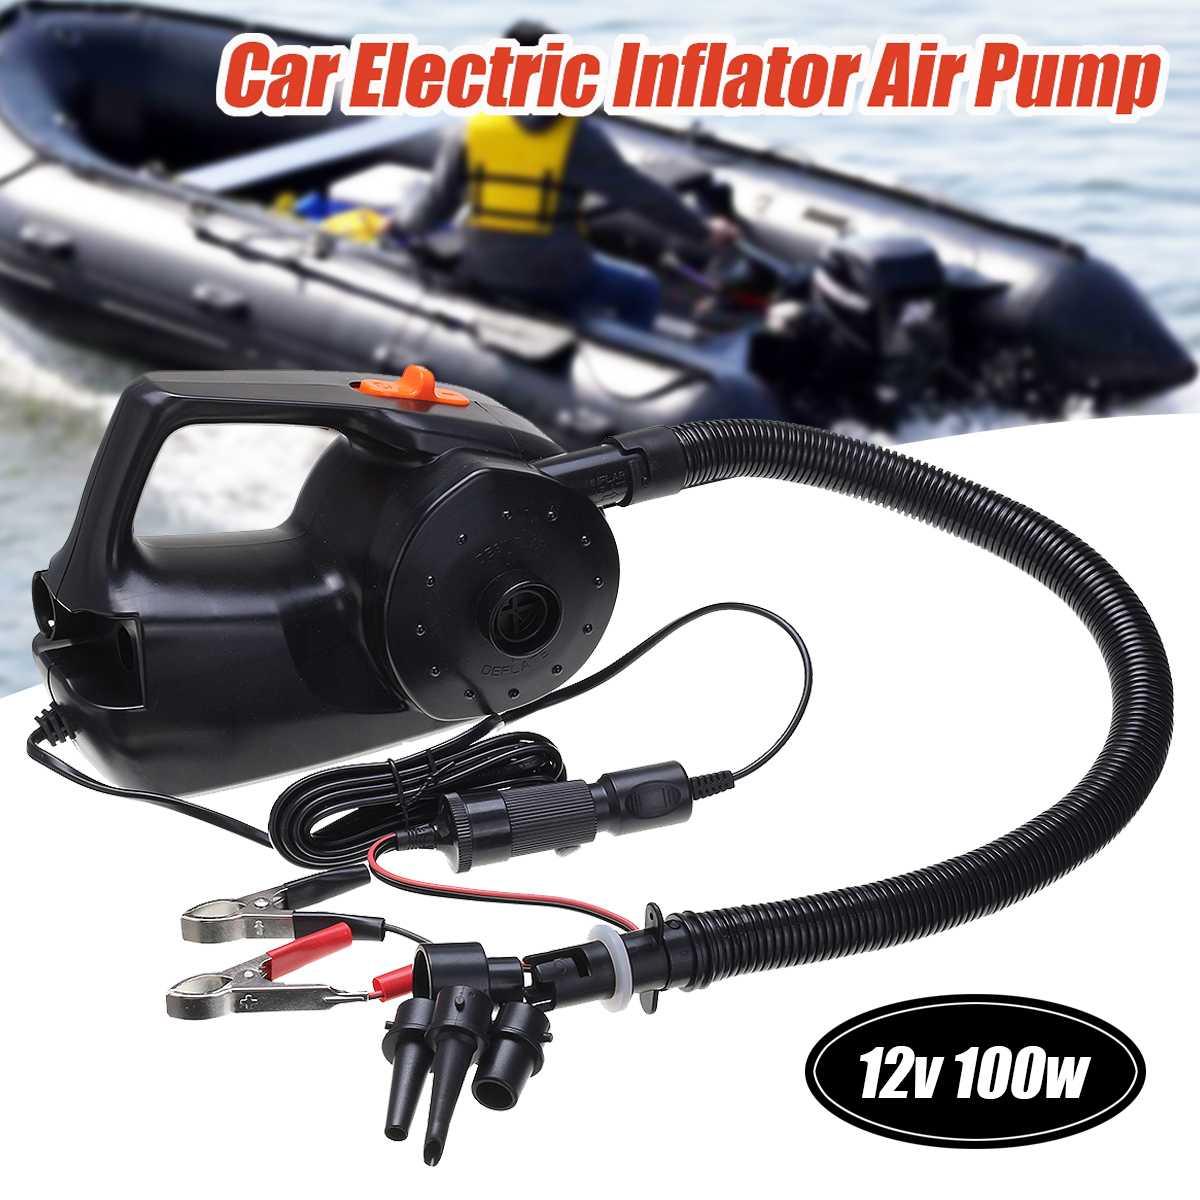 Bomba de aire inflable eléctrica recargable de 12V y 100W para Kayak, barco, piscina, cojines de aire, bola, ventilador portátil para coche